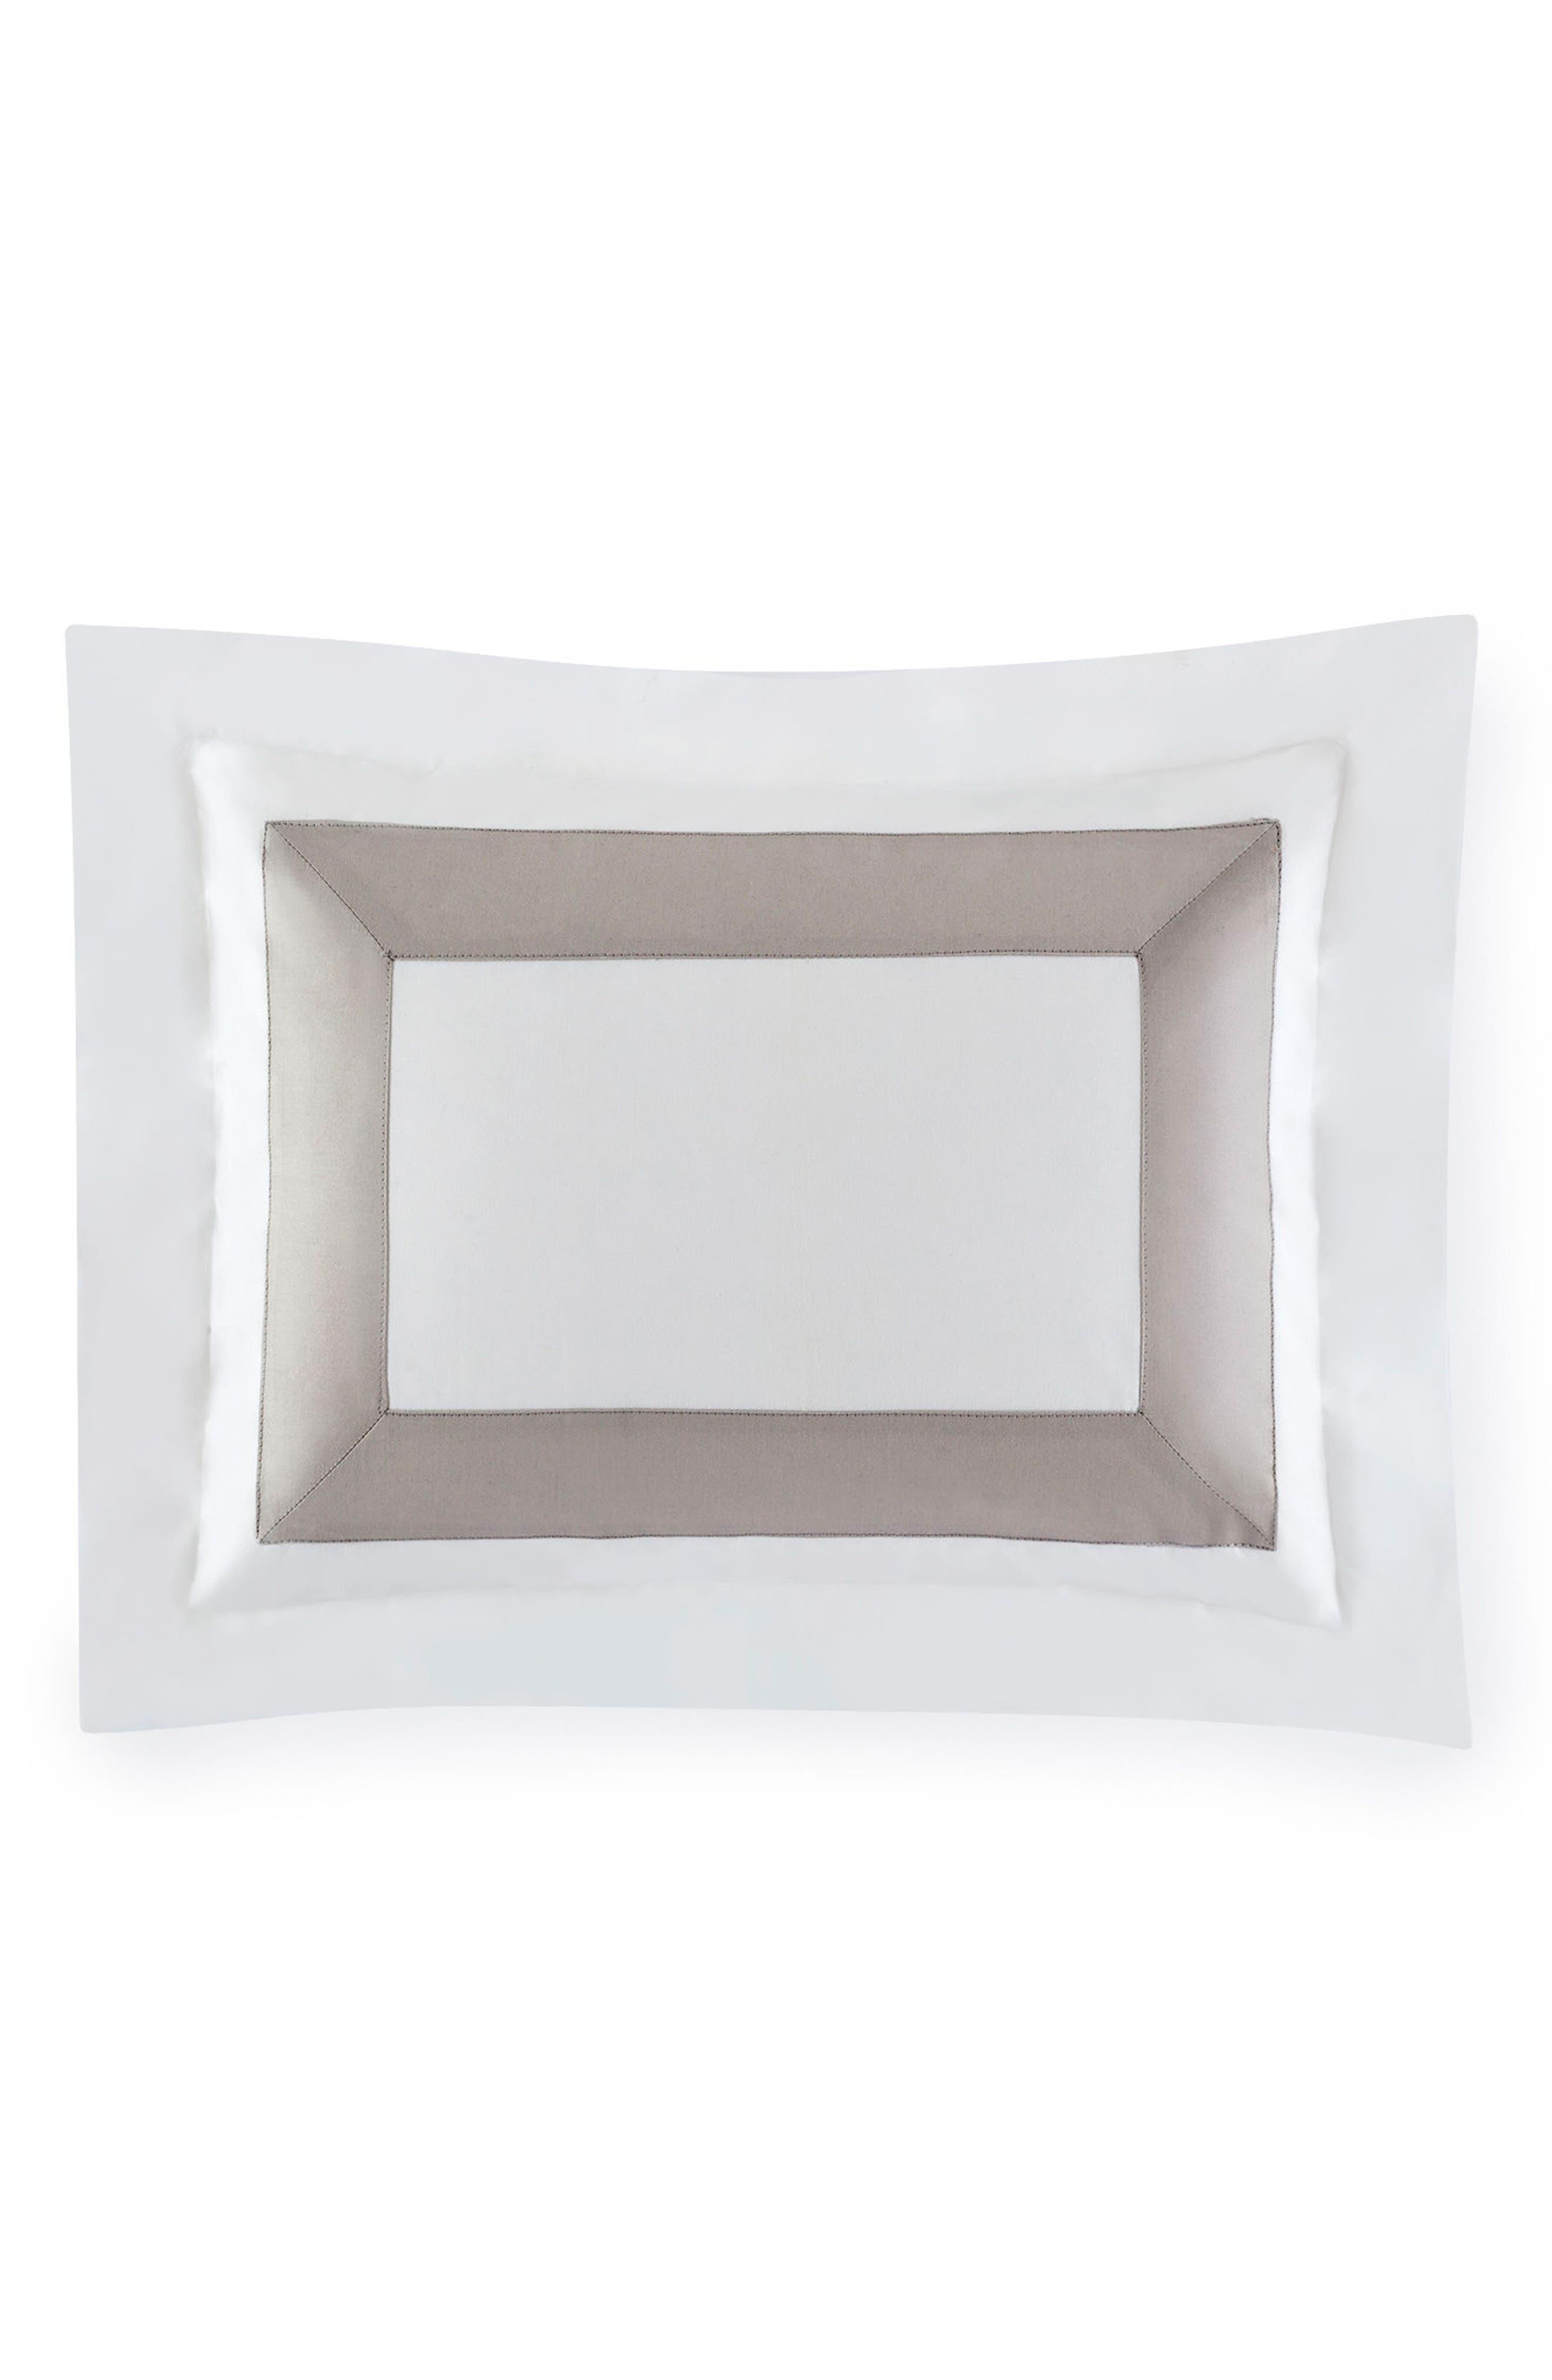 Orlo Boudoir Sham,                         Main,                         color, WHITE/ GREY